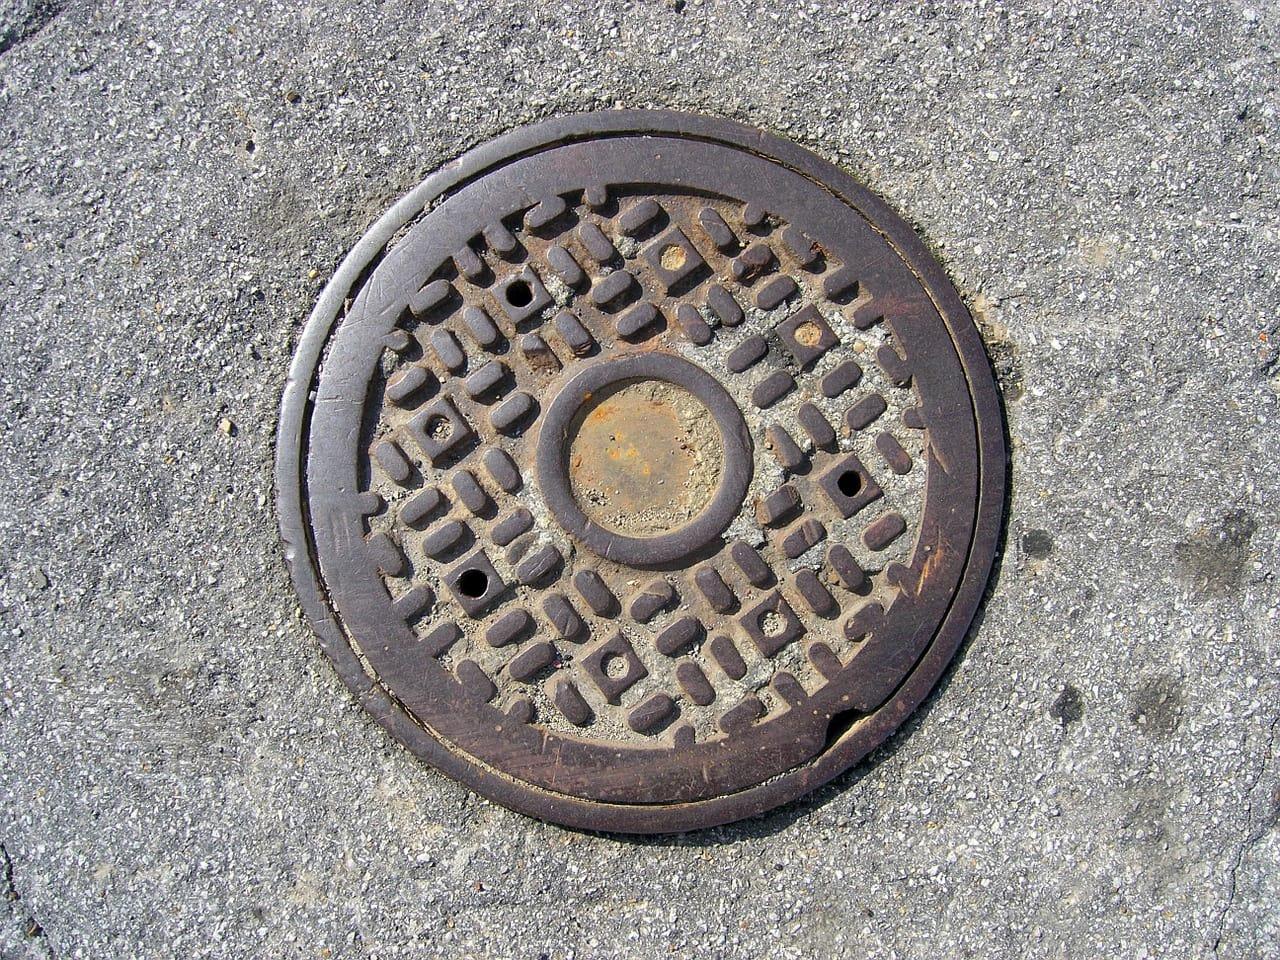 sewer-manhole-687817_1280